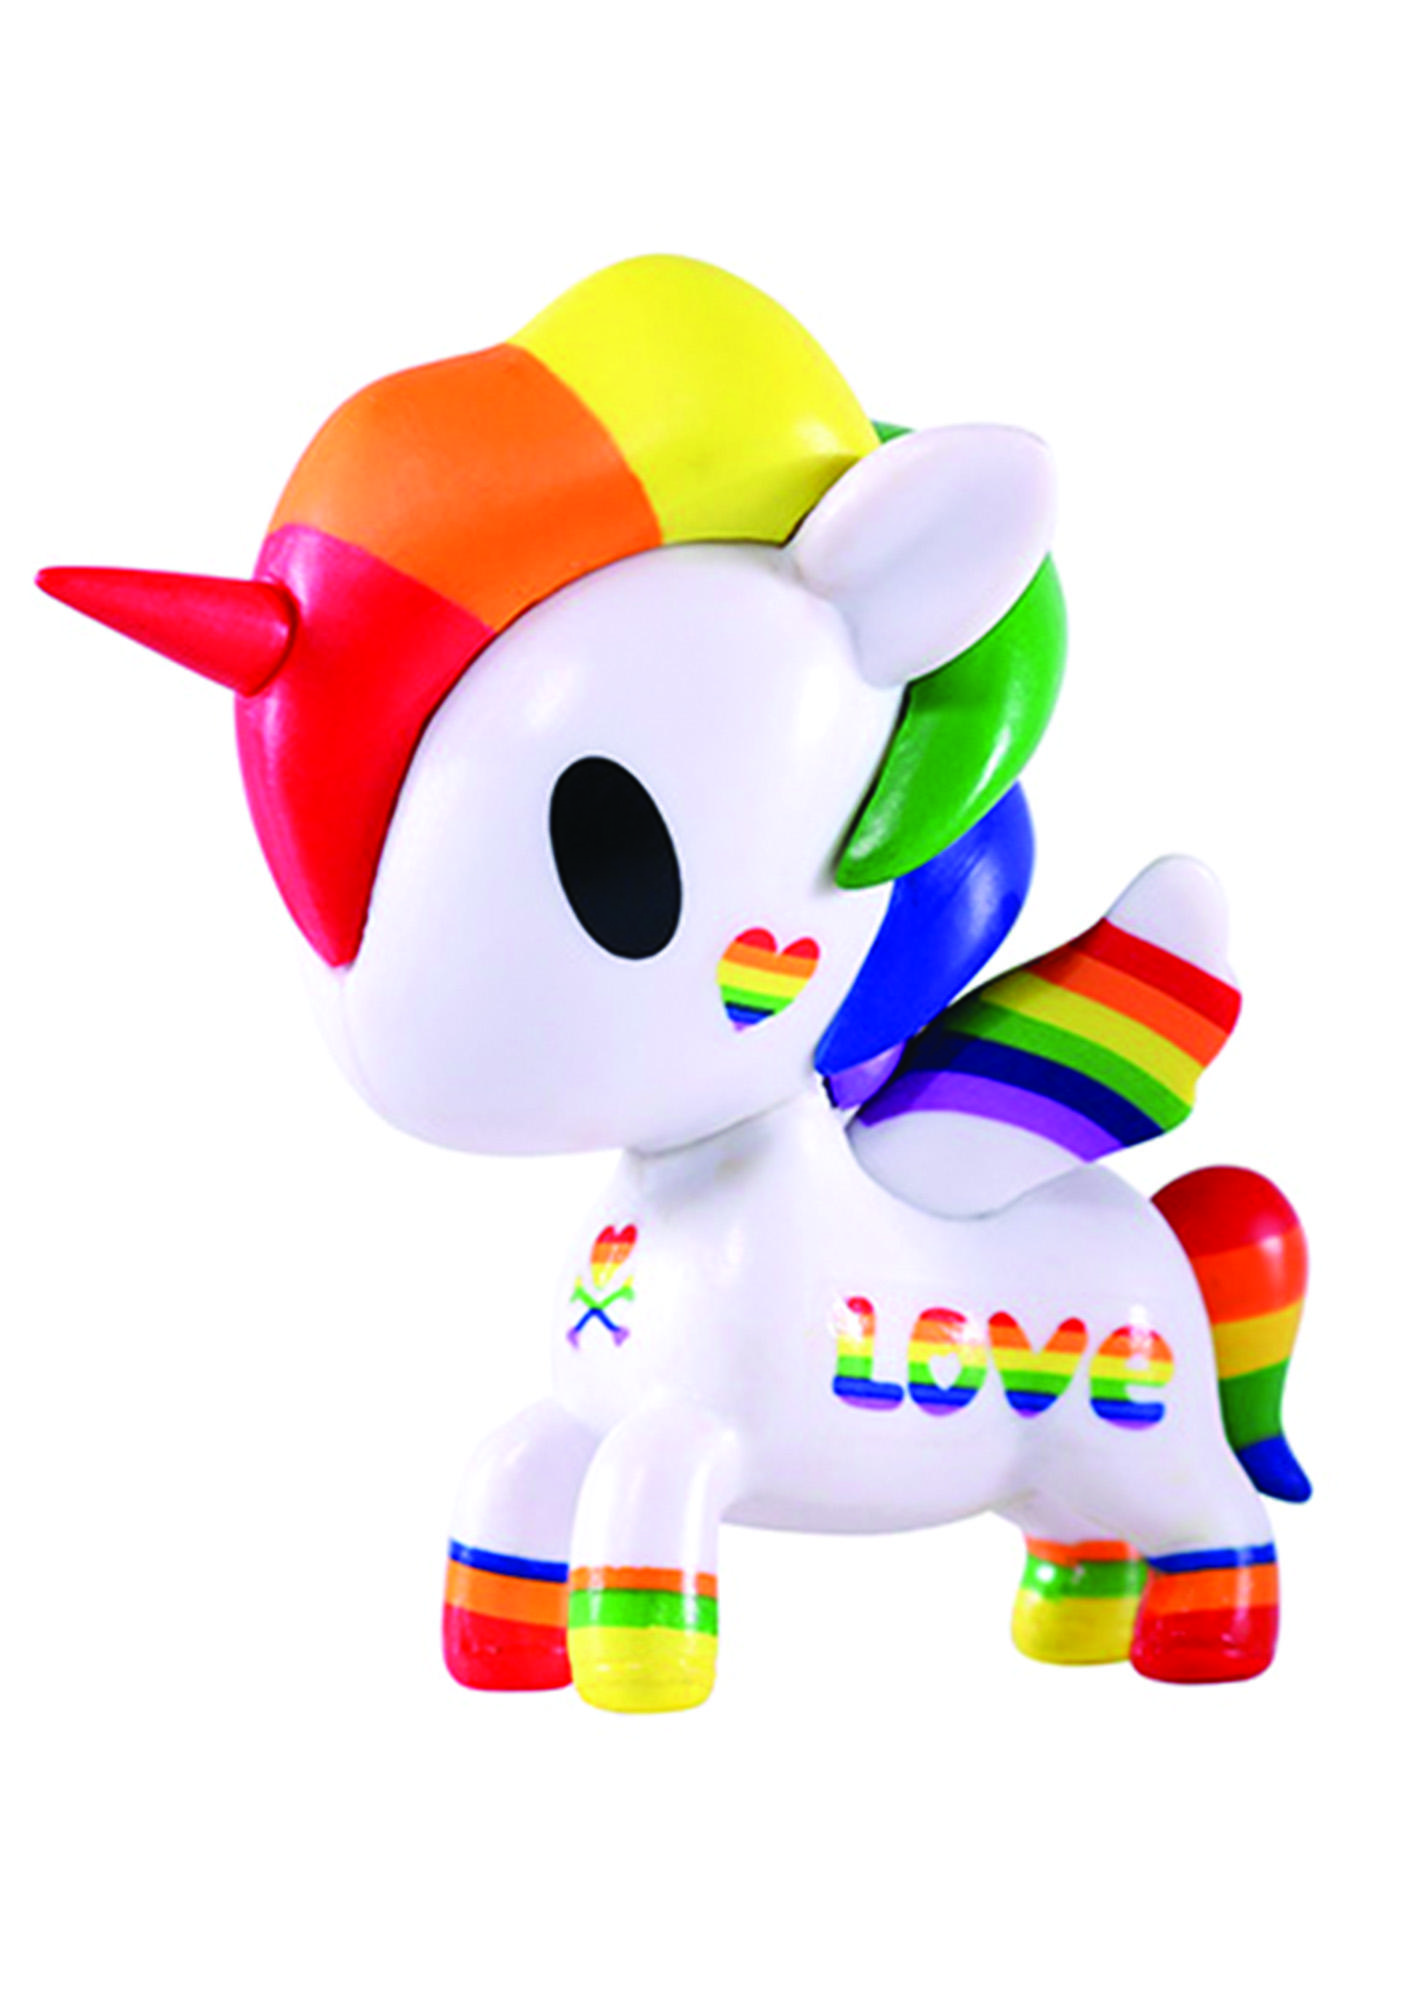 Tokidoki Unicorno 2PK Rainbow Set